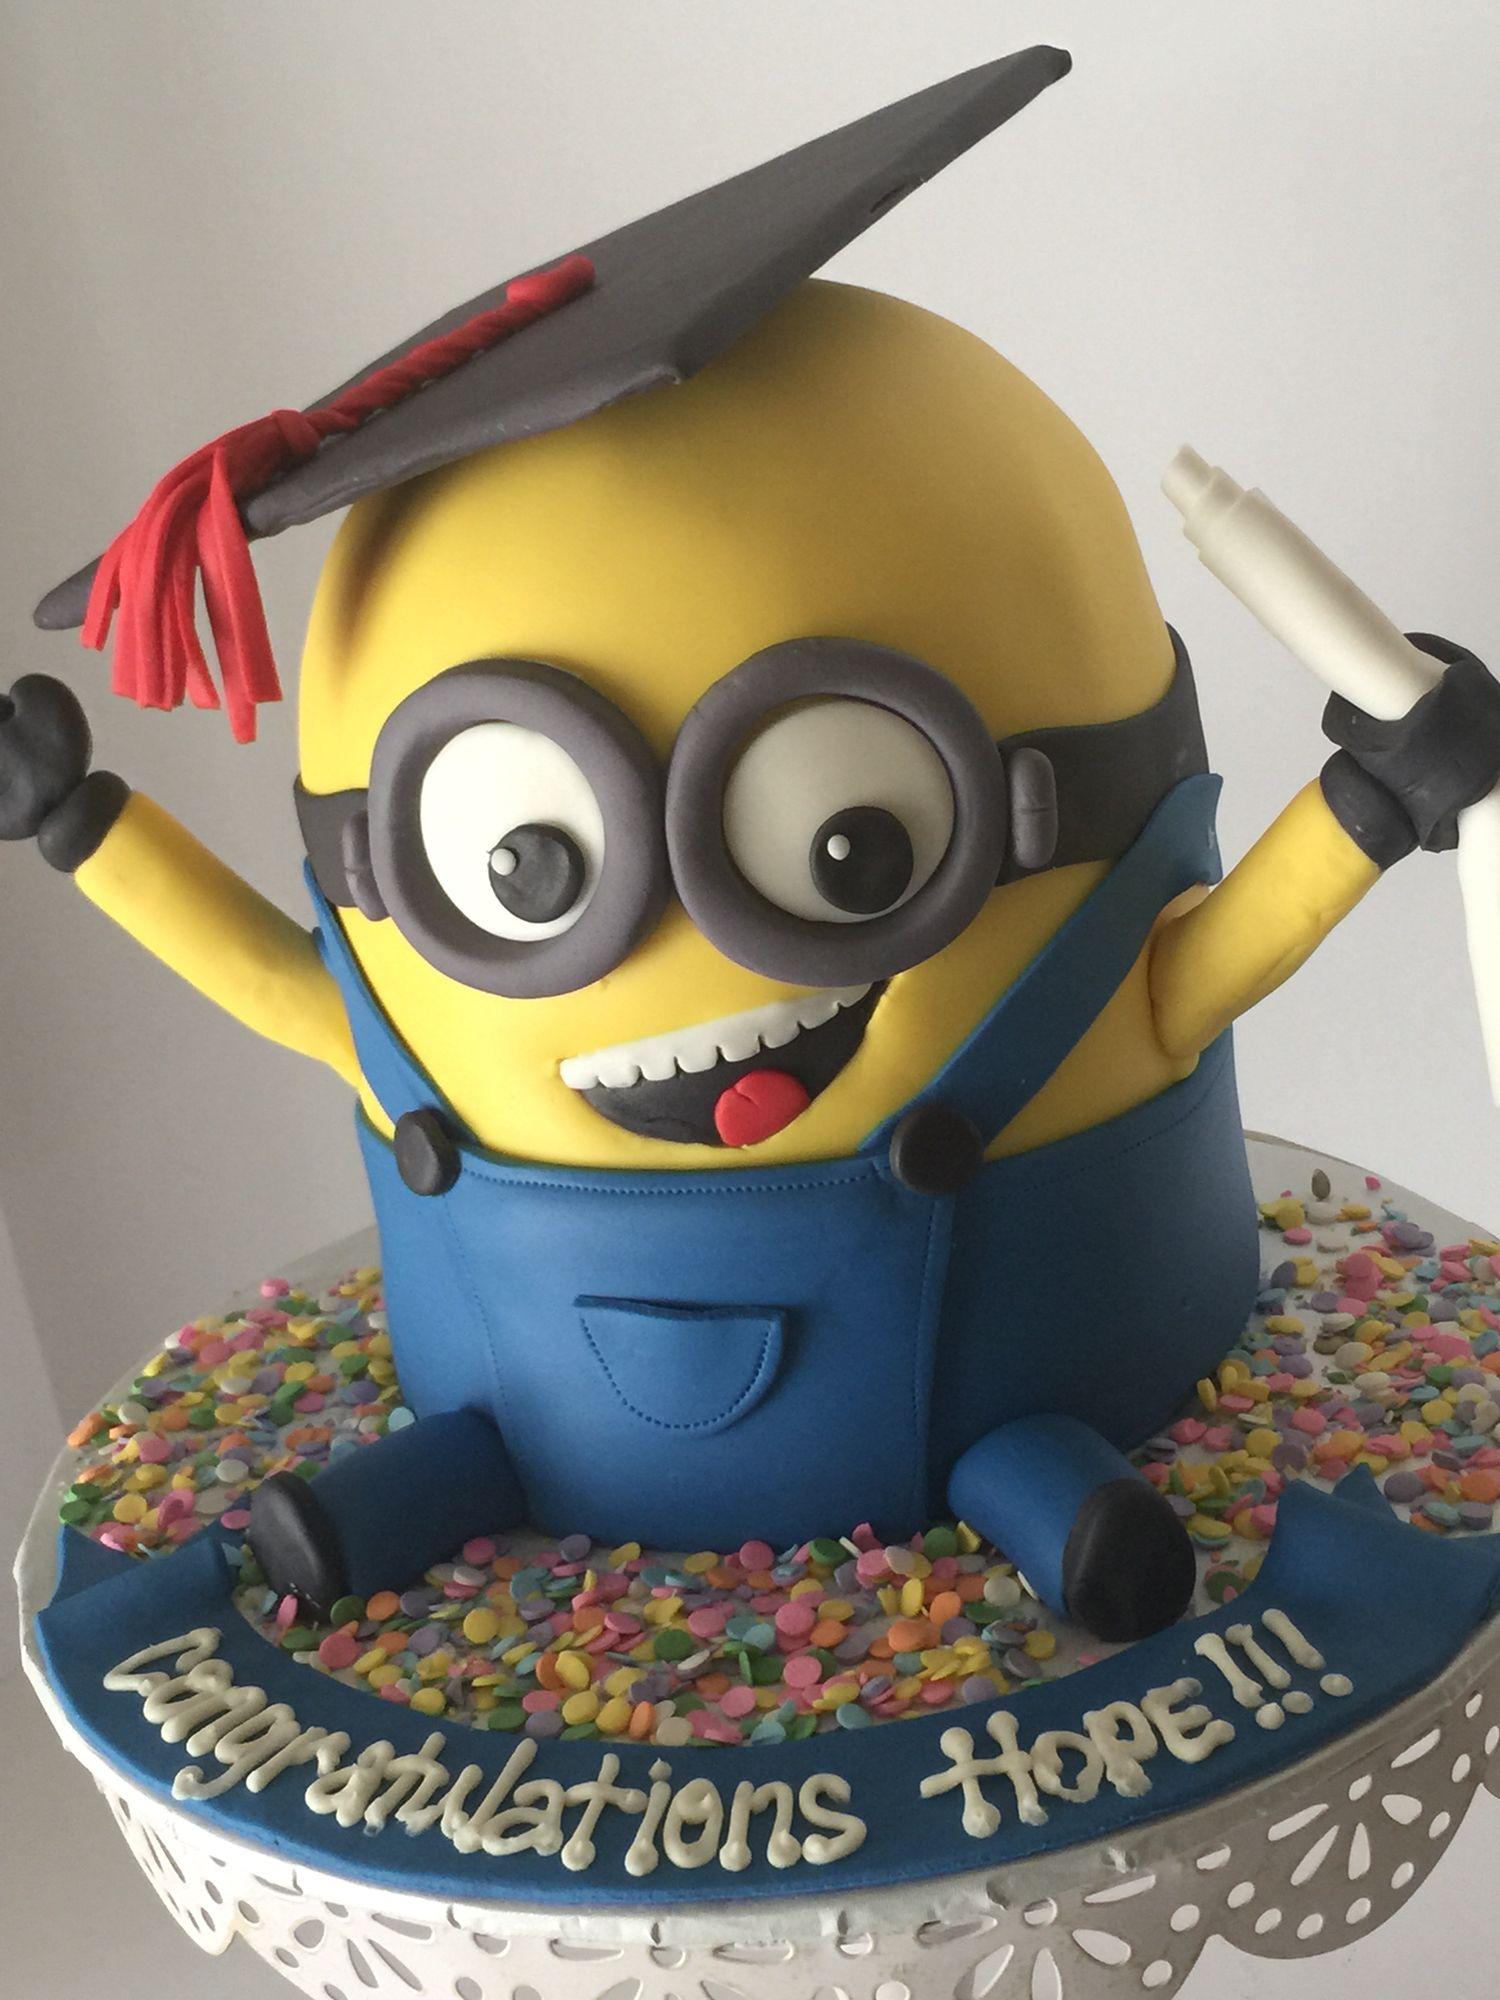 Minion graduation cake graduation pinterest cake graduation and cupcakes - Cake decorations minions ...